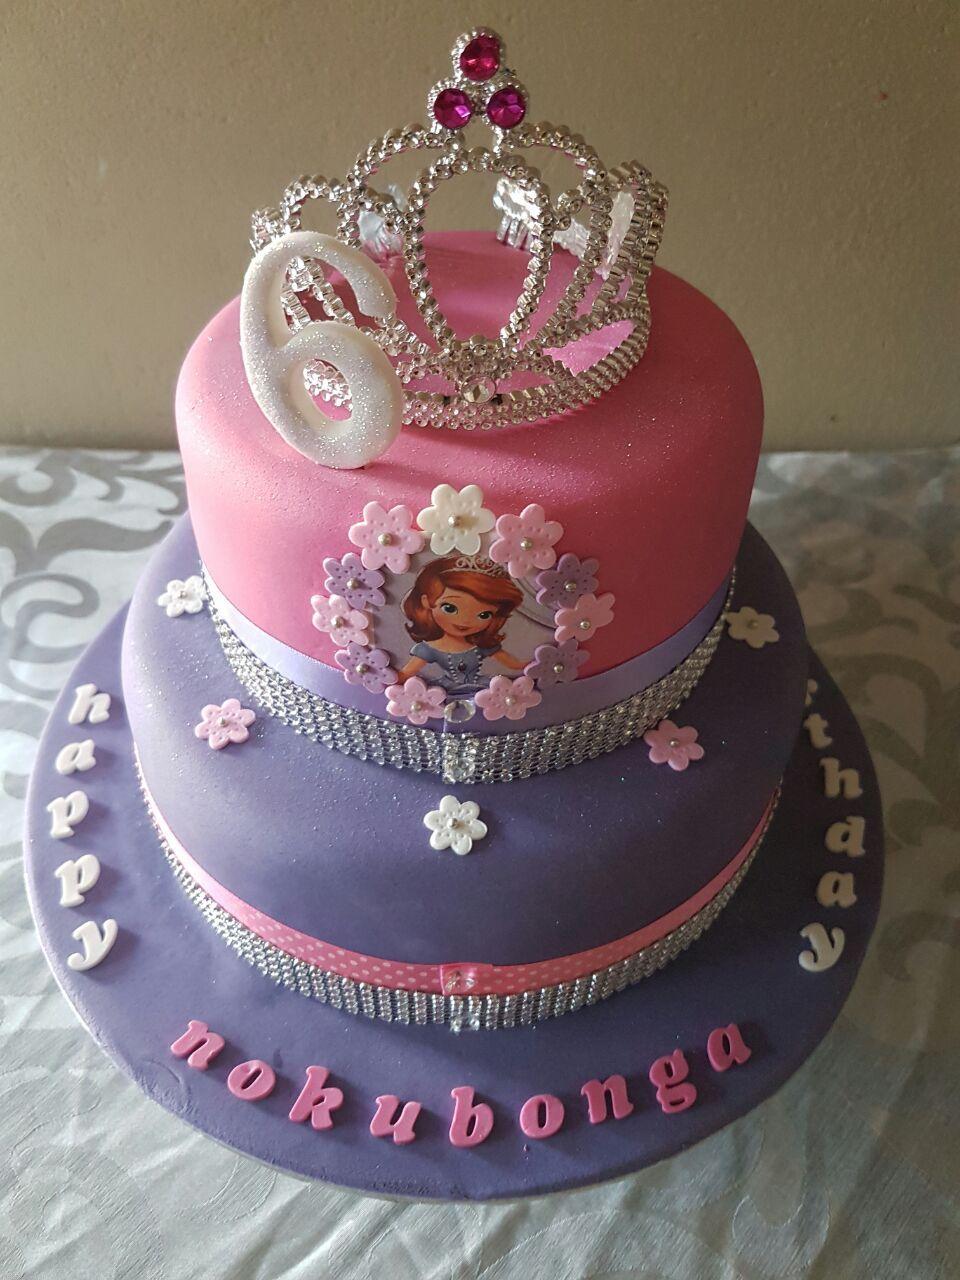 Magnificent 21 Wonderful Picture Of Princess Sofia Birthday Cake Birijus Com Personalised Birthday Cards Veneteletsinfo